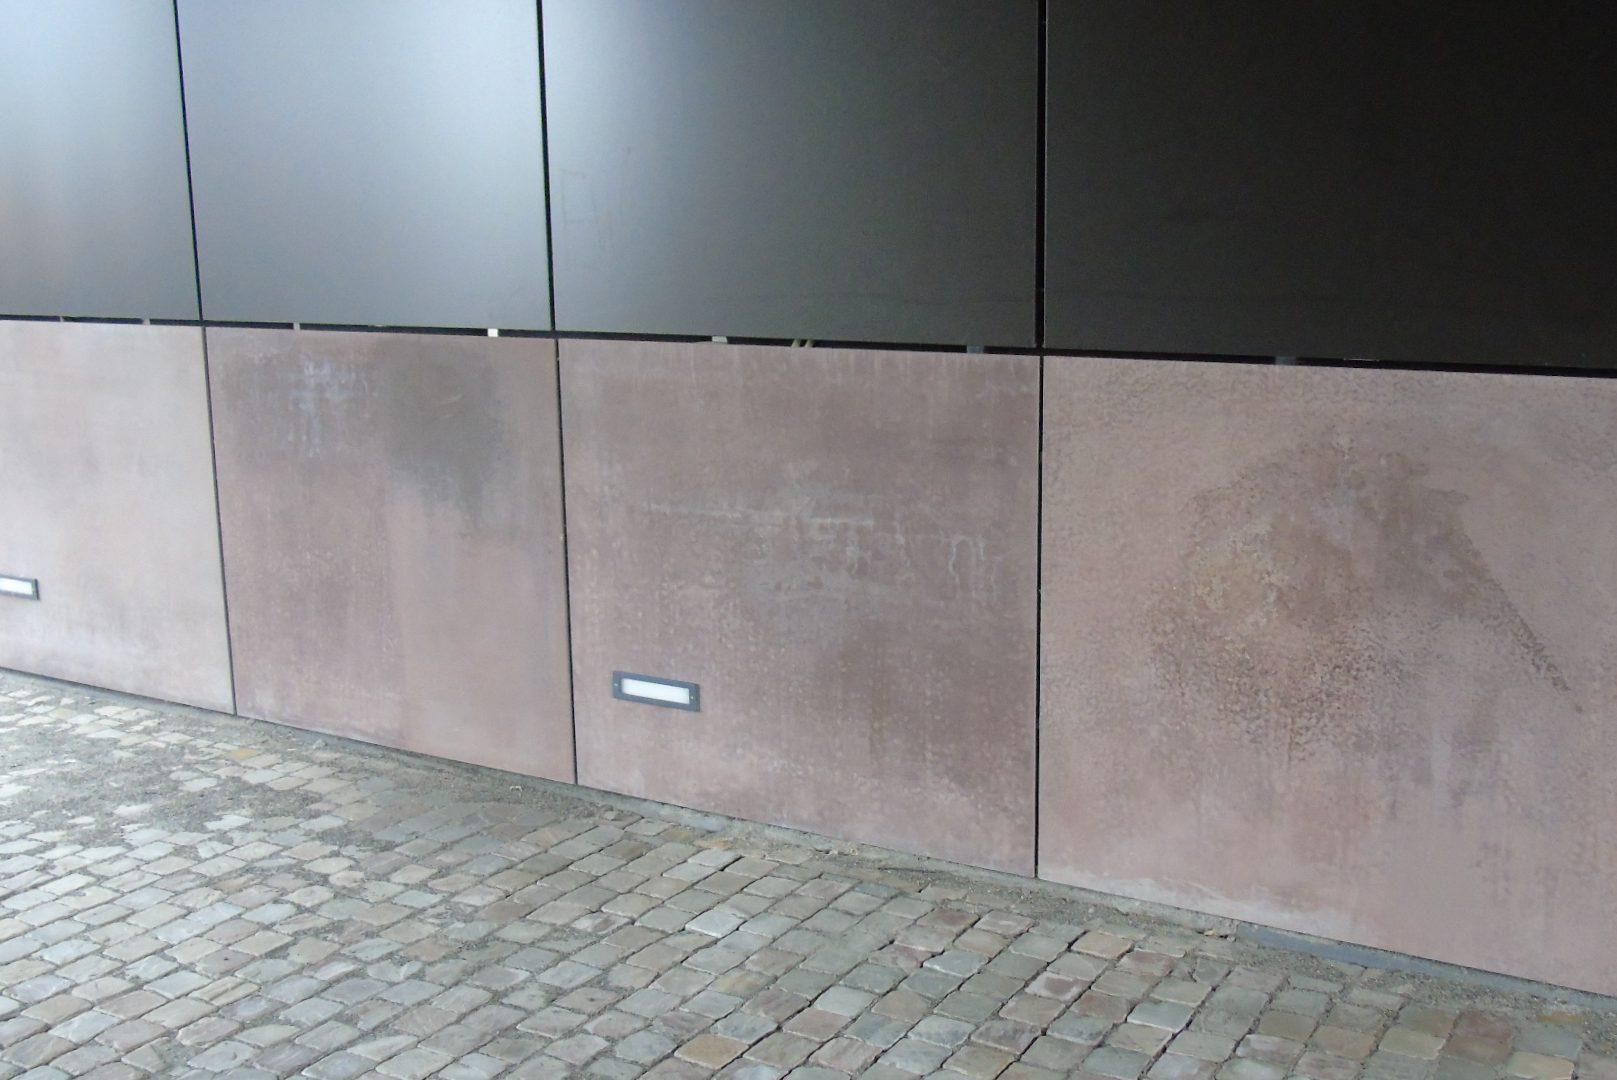 gevelafwerking, glasvezelversterkt prefab beton